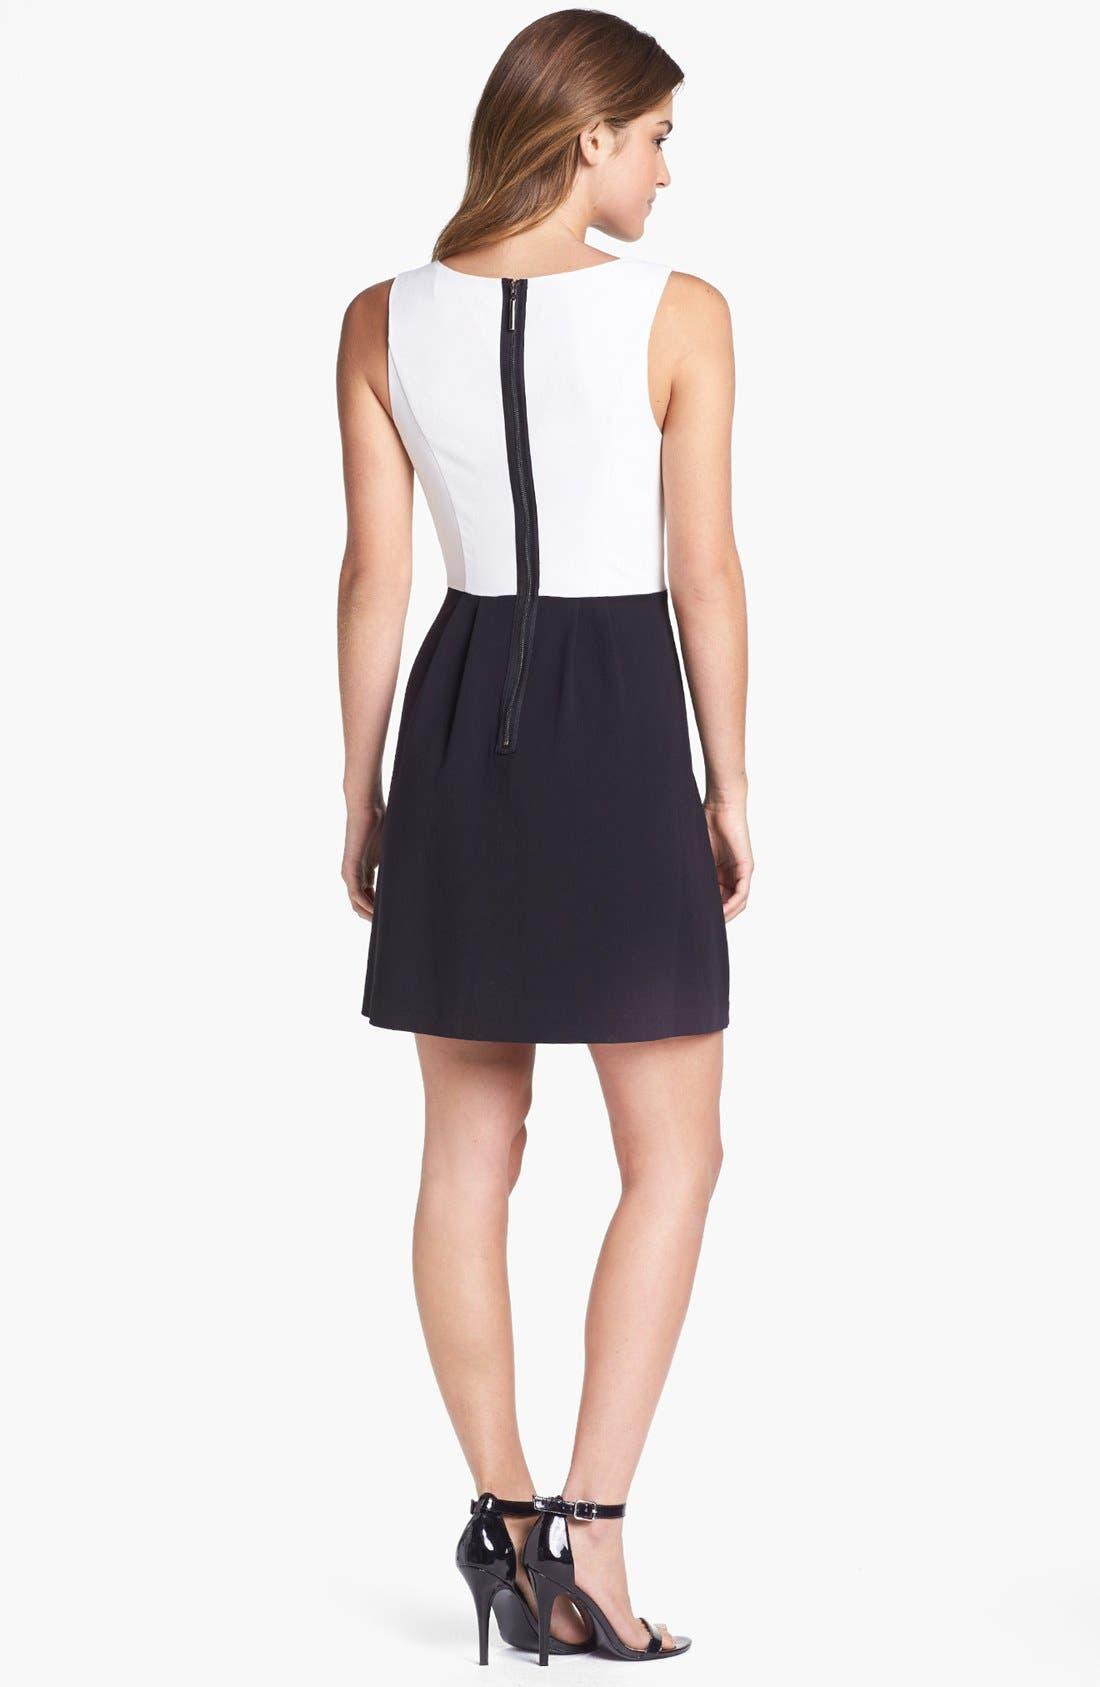 Alternate Image 2  - kensie Laser Cut Faux Leather Inset Colorblock Dress